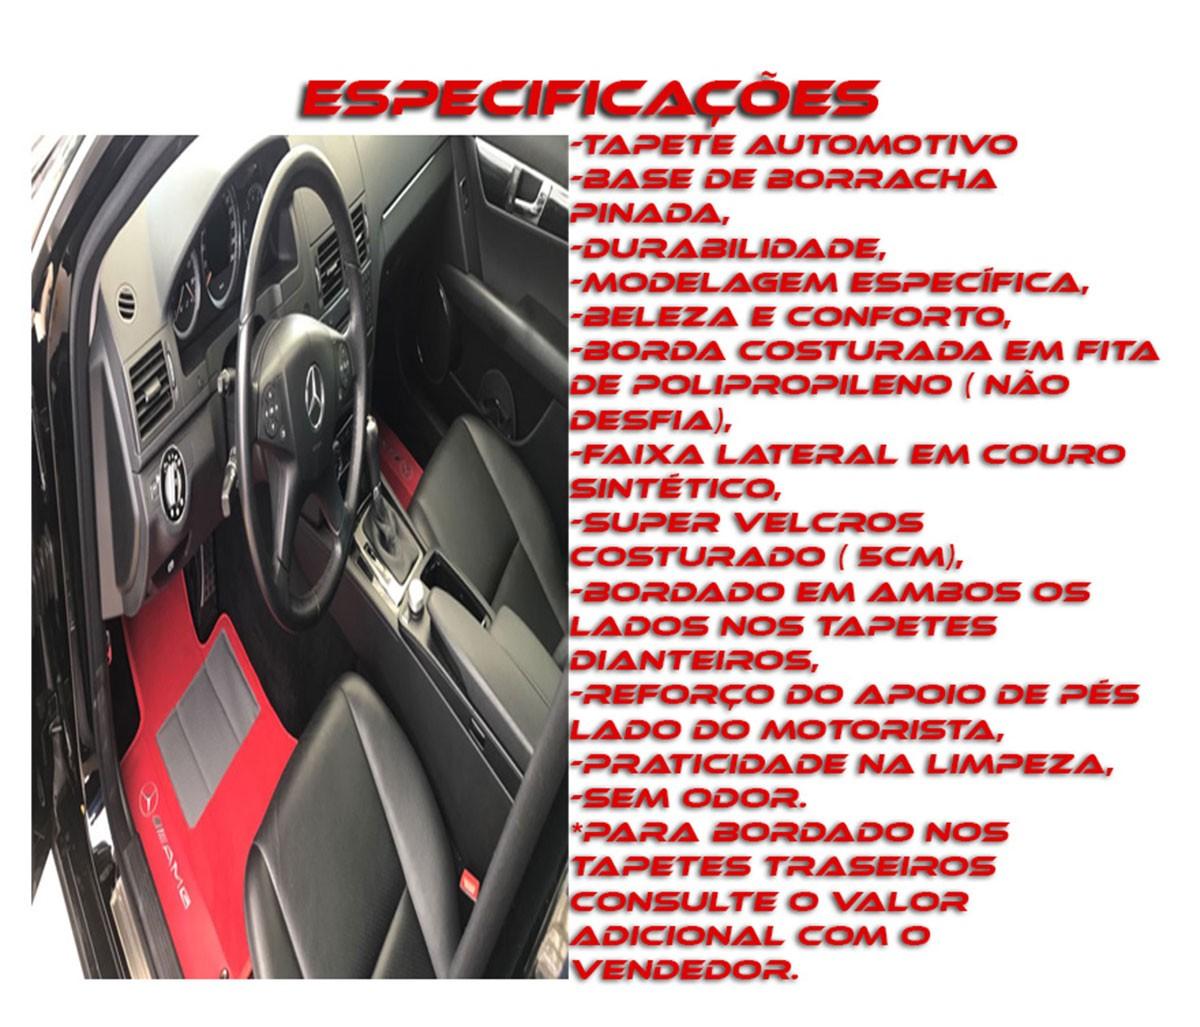 Tapete Jac J3 Hatch Borracha Pvc Com Base Pinada